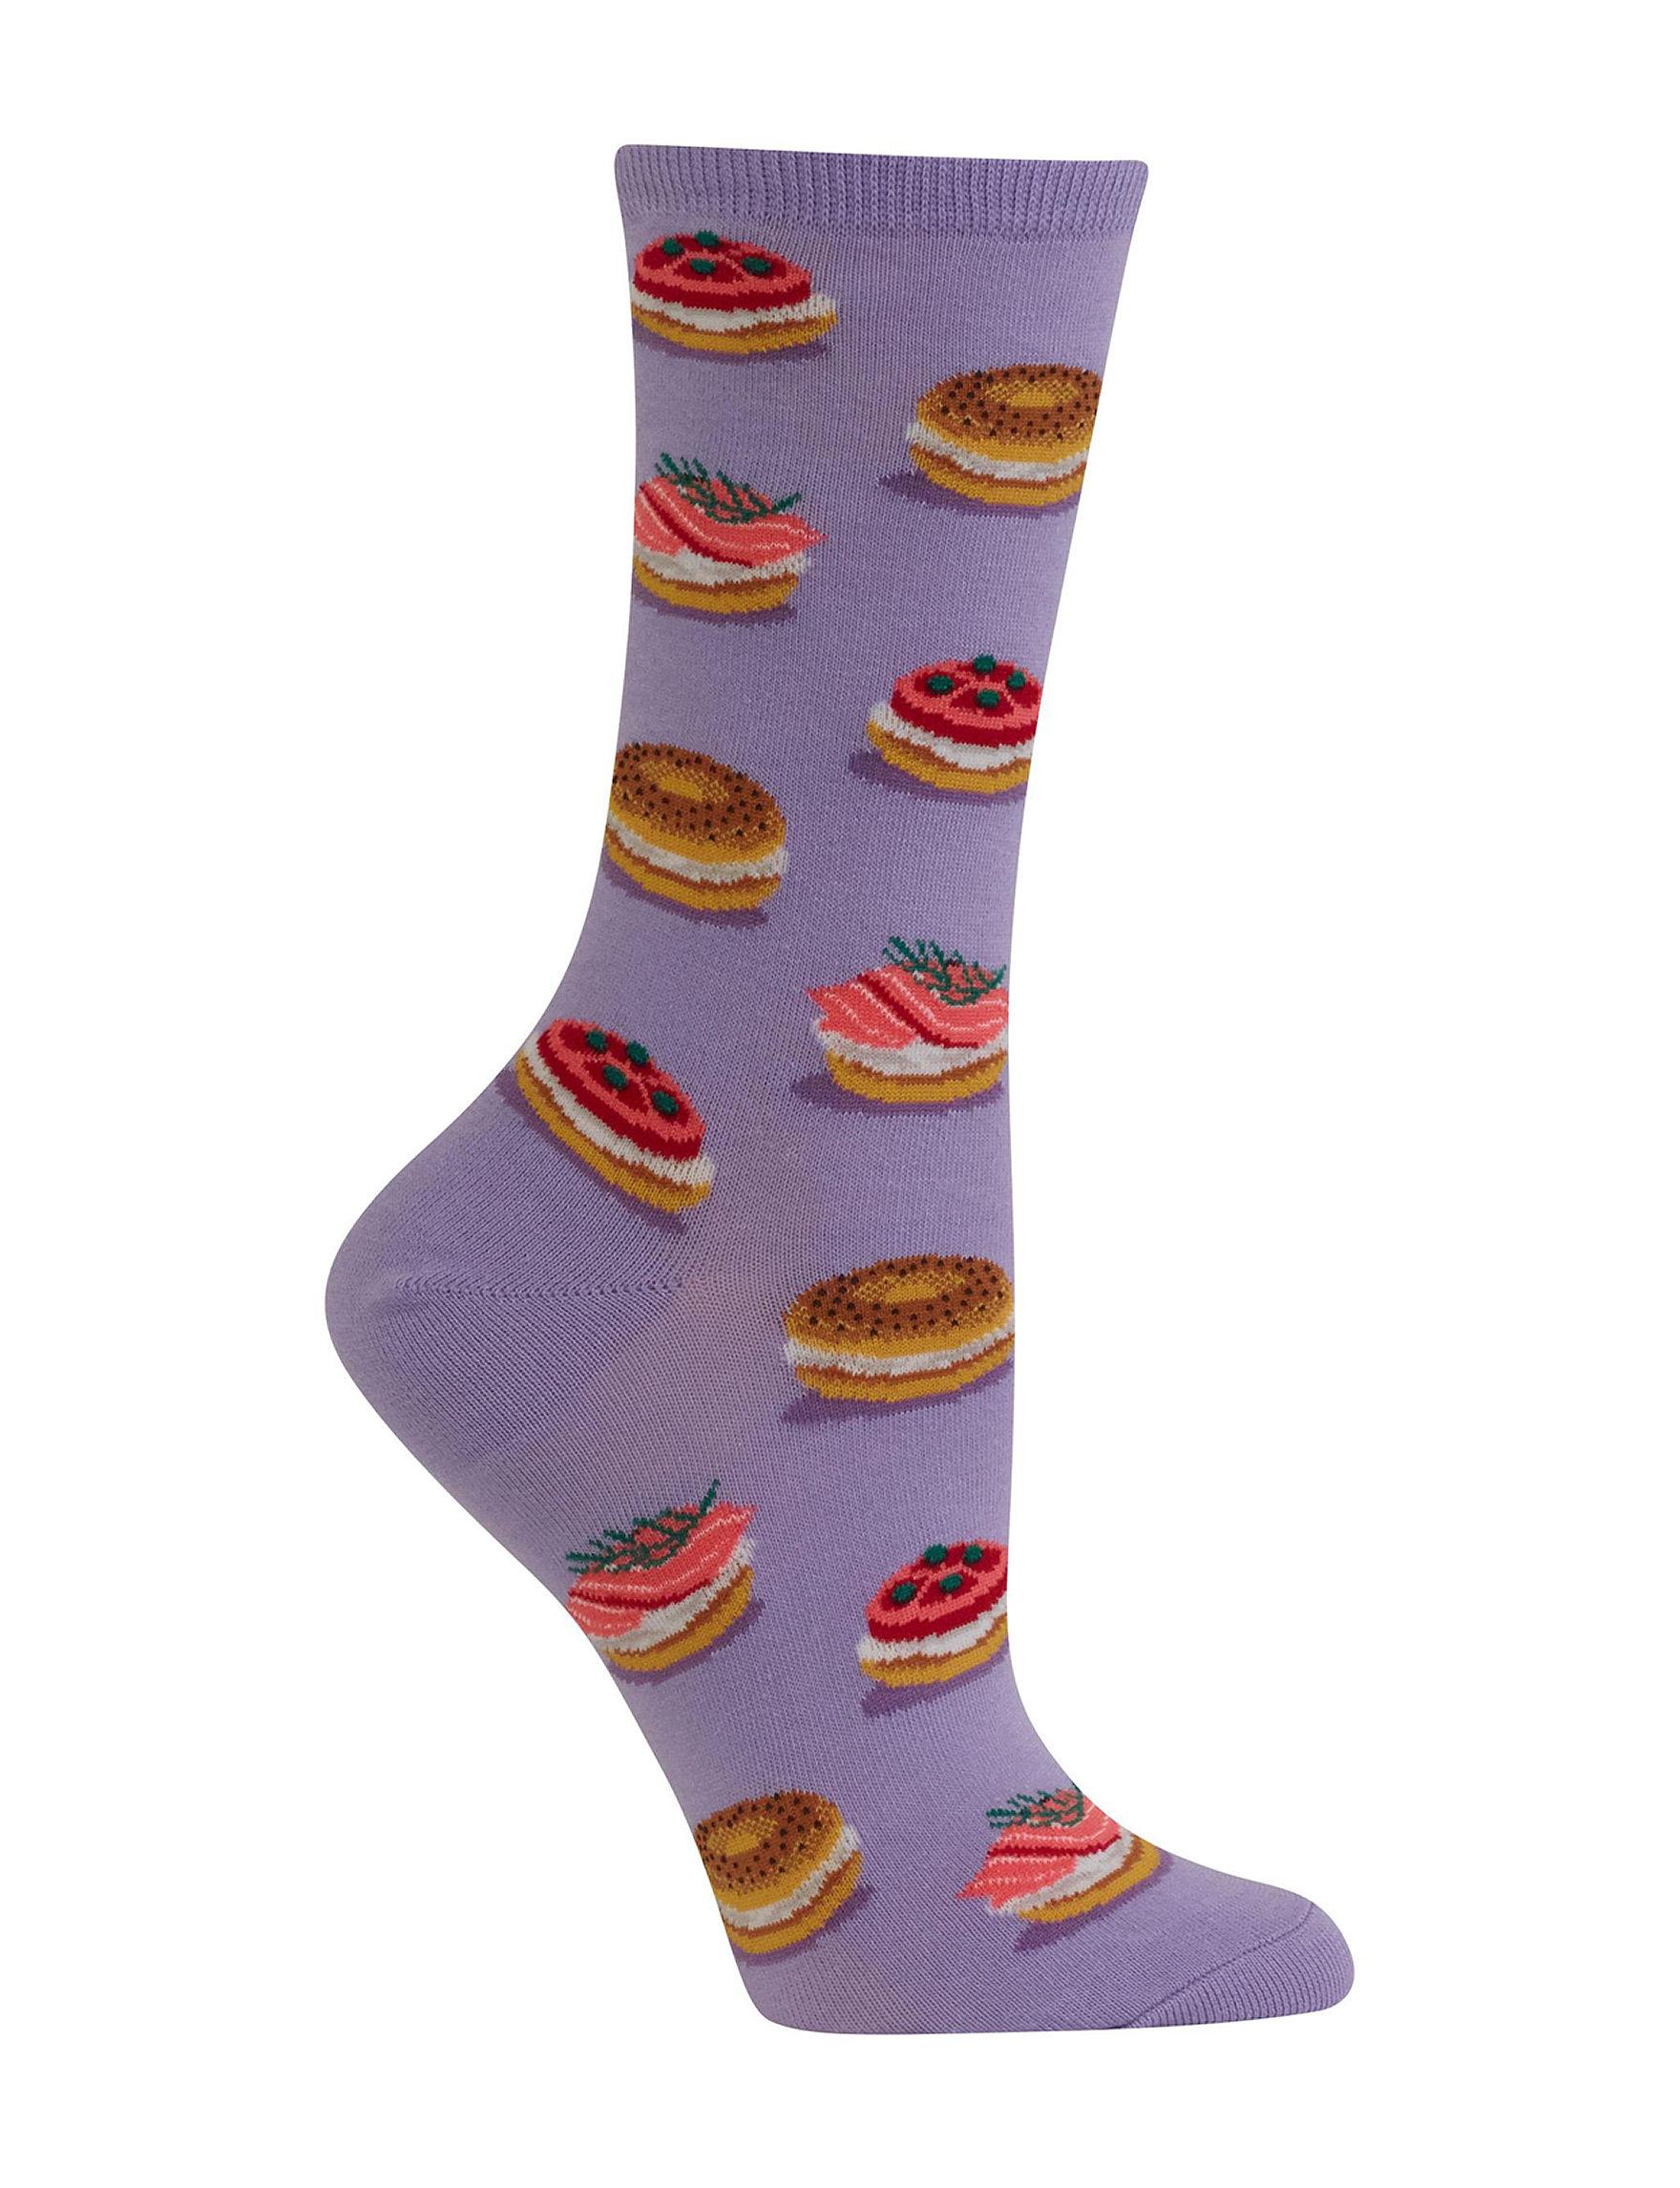 Hot Sox Lavender Socks